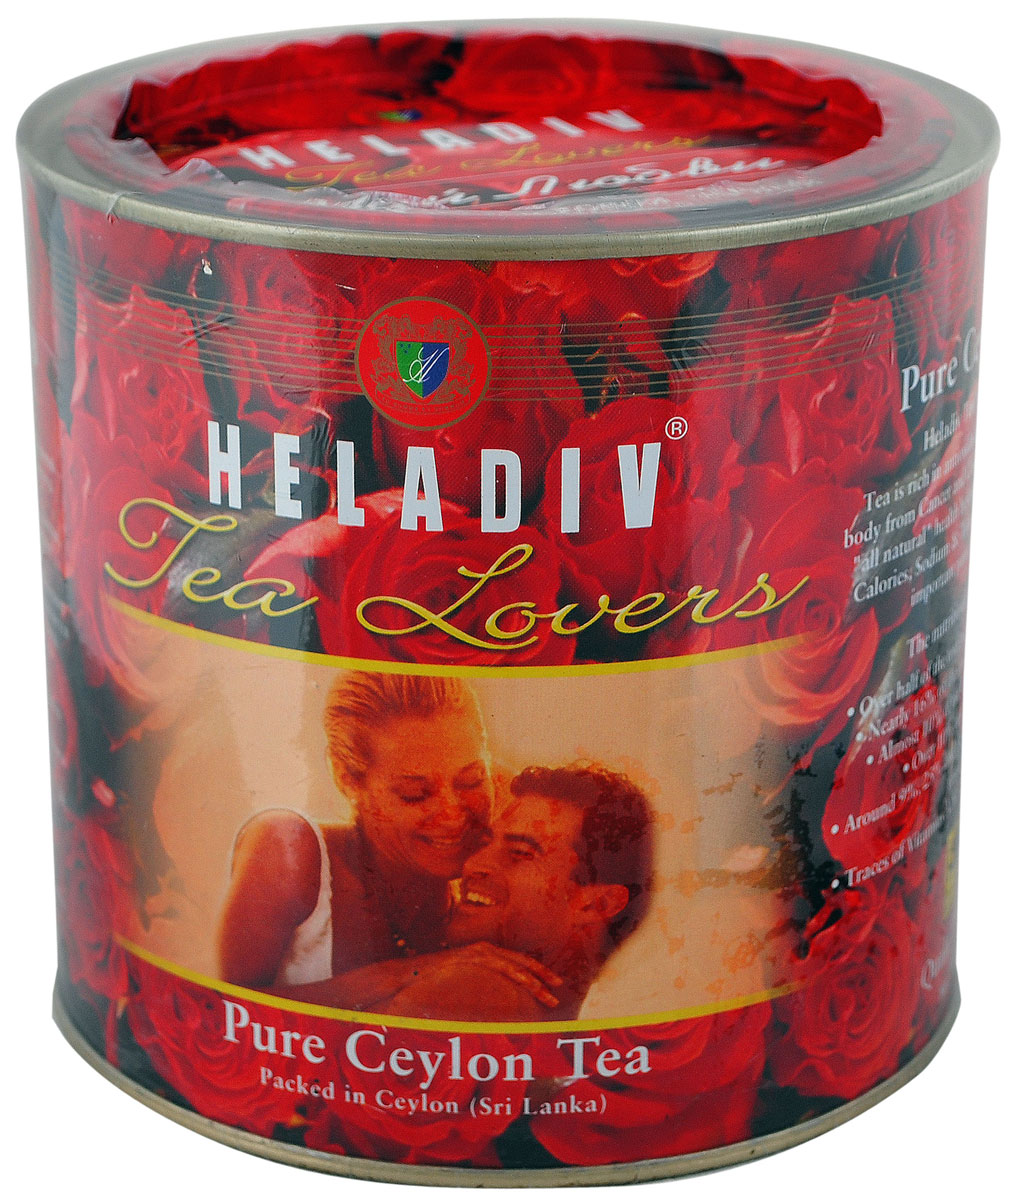 Heladiv Tea Lovers чай черный листовой, 450 г чай heladiv чай черный листовой heladiv pekoe 400г